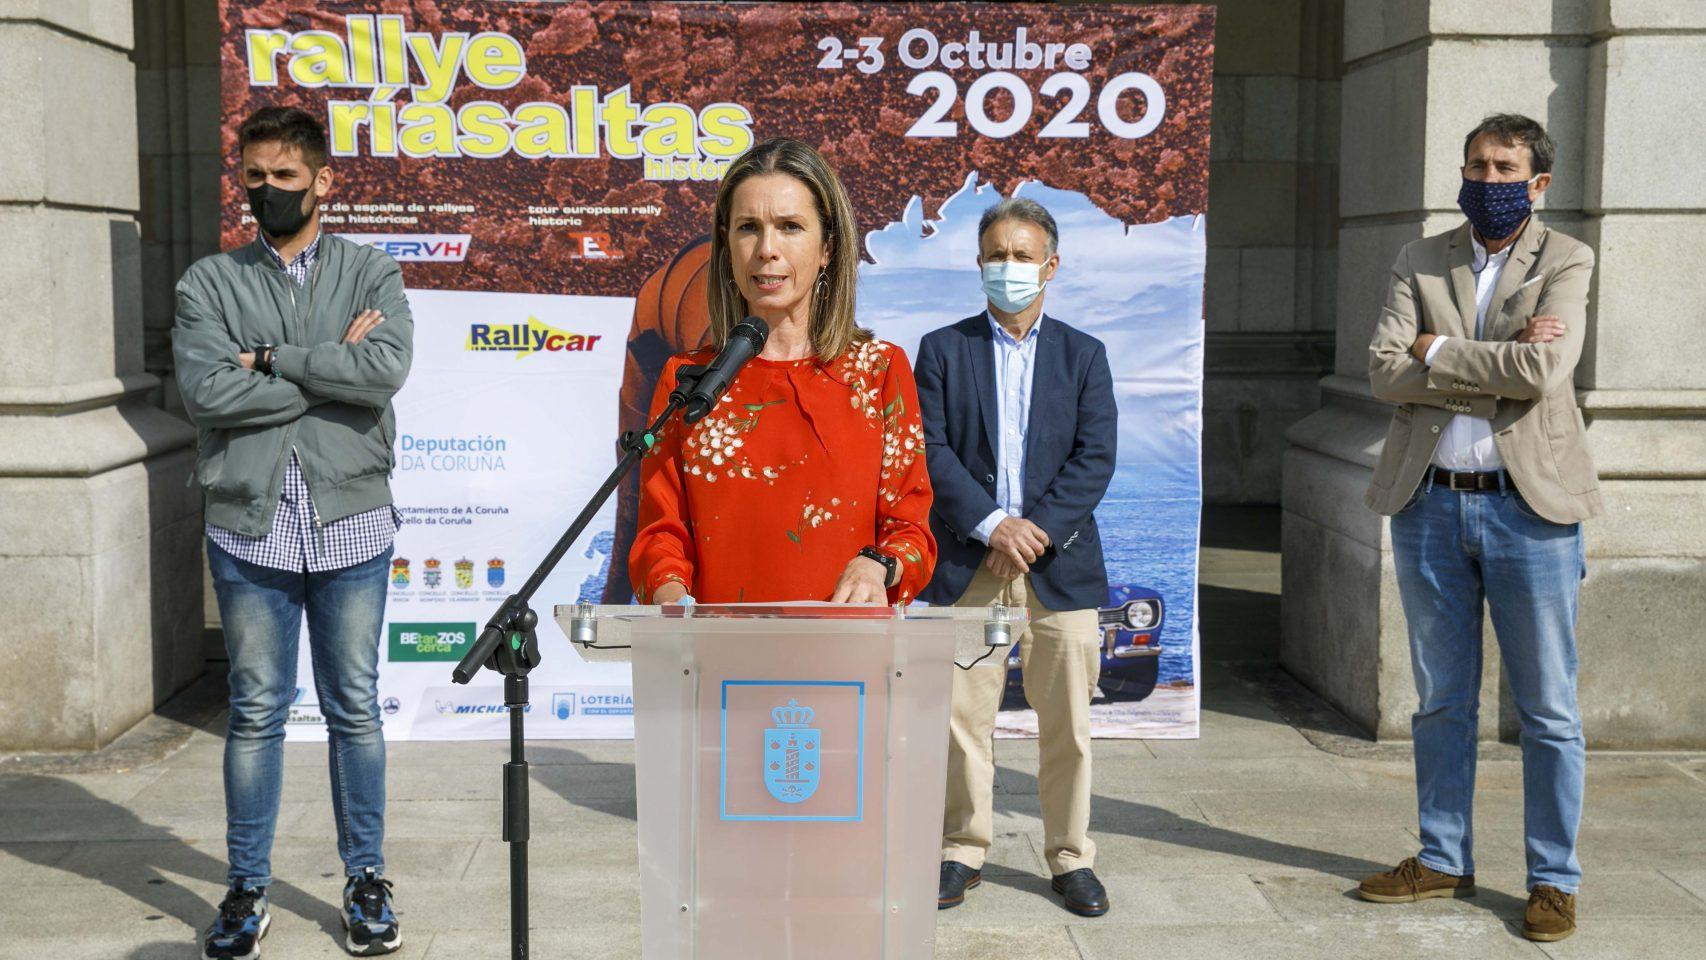 CERVH + TER Historic: Rallye Rias Altas Histórico [2-3 Octubre] Apg_20200930_MONICA_MARTINEZ_PRESENTACION_RALLY_RIAS_ALTAS_VEHICULOS-2-1706x960